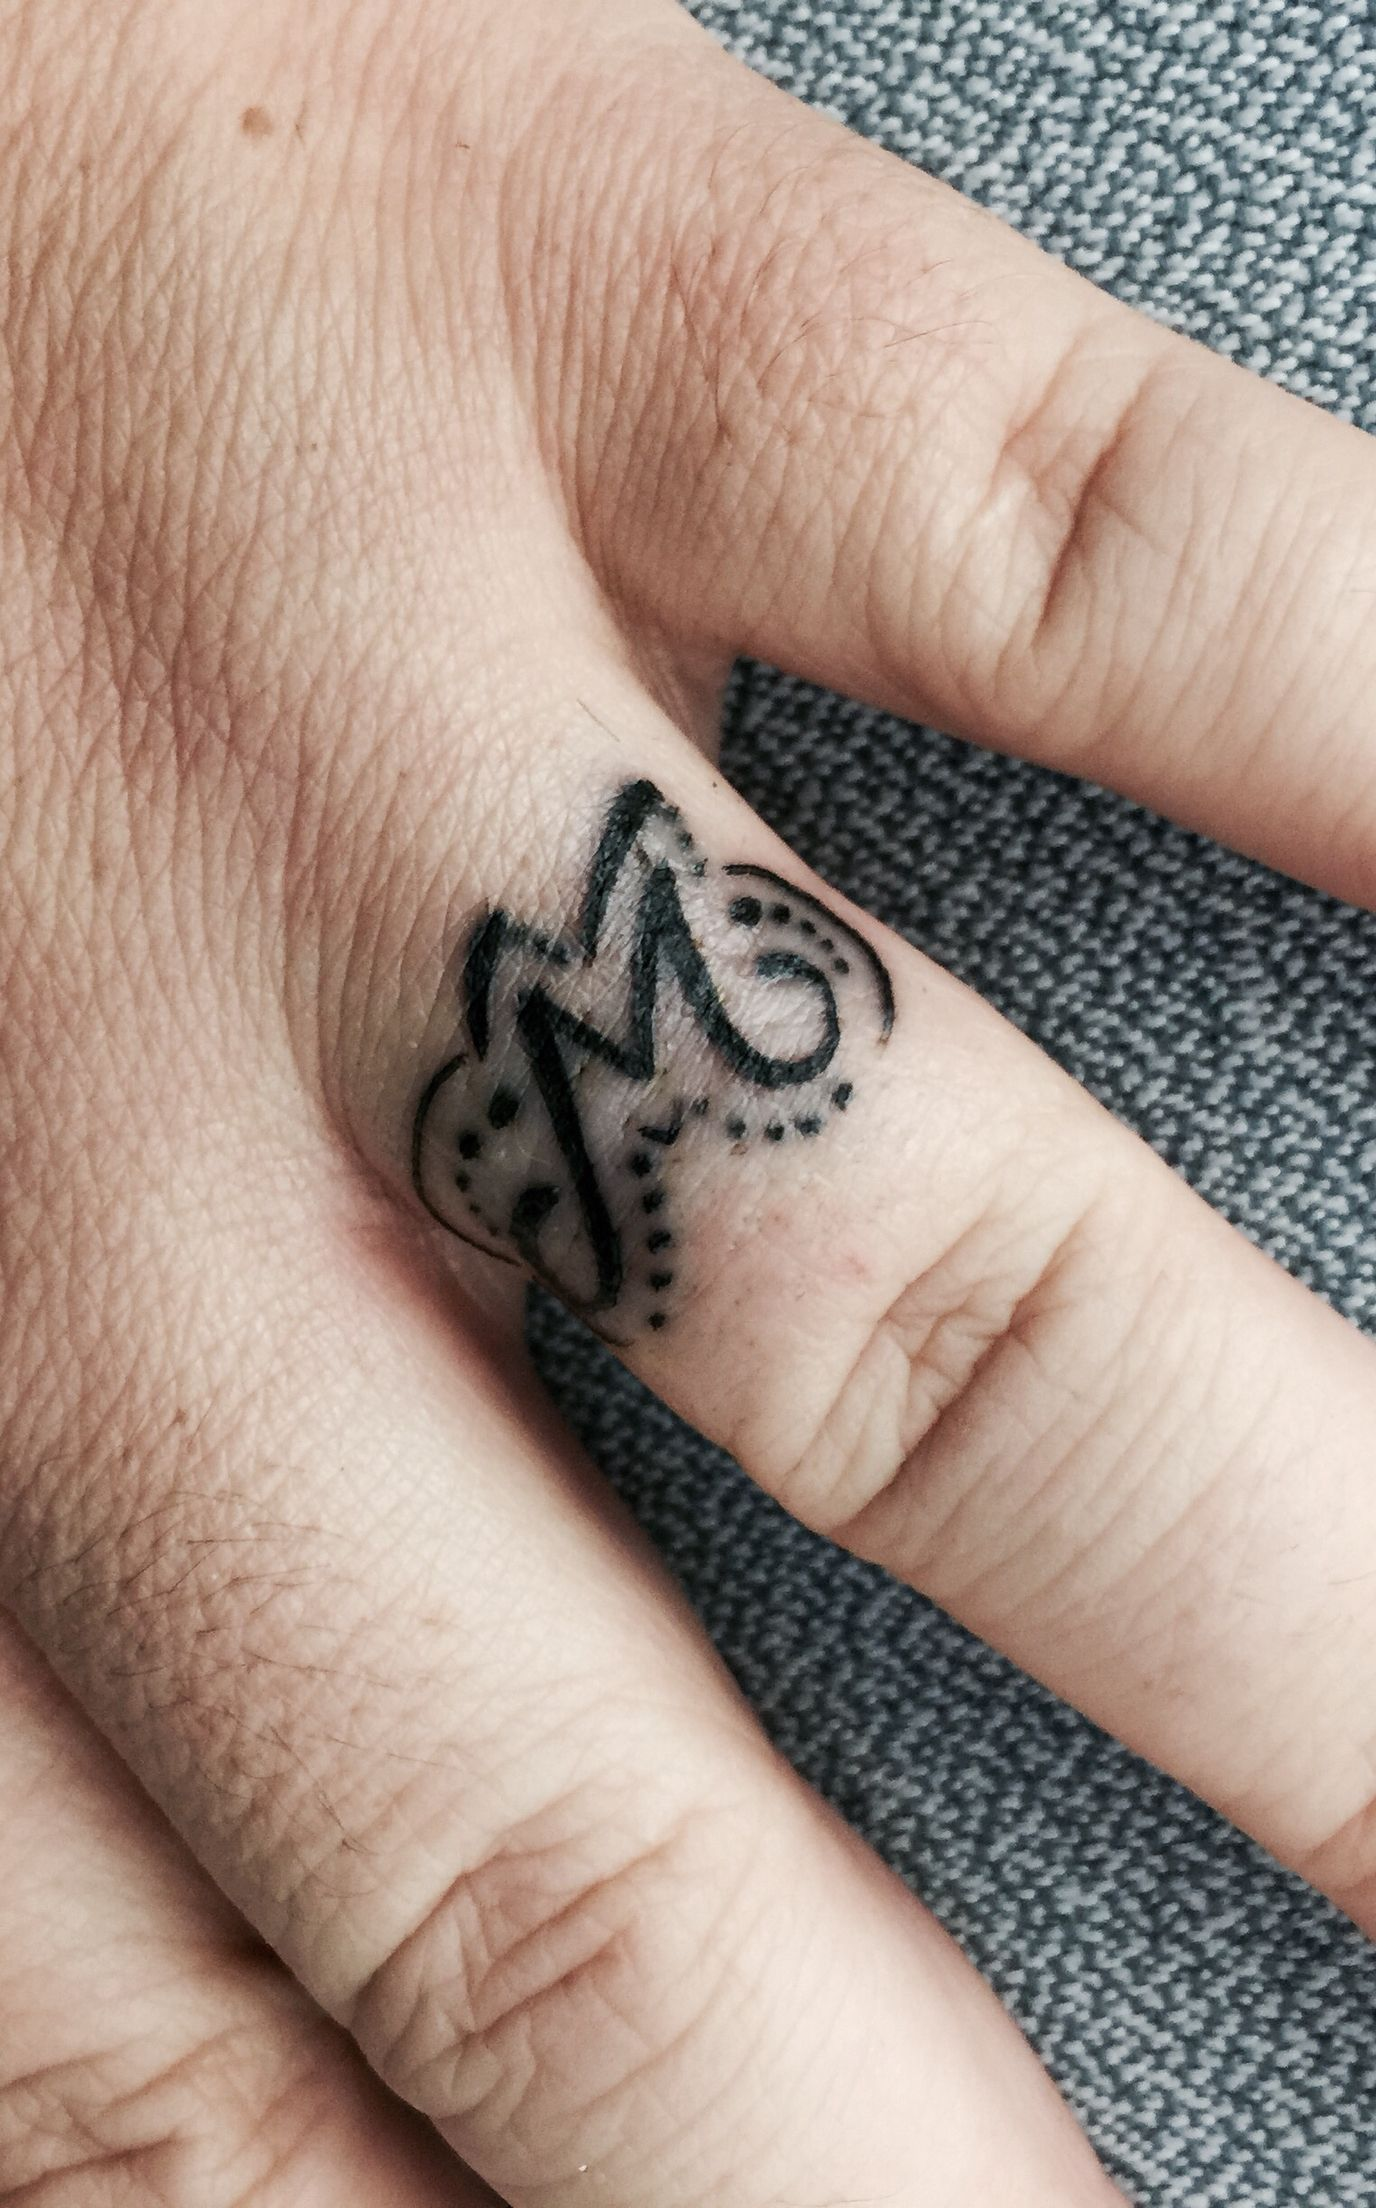 Soulmate Wedding Ring Tattoos : soulmate, wedding, tattoos, Wedding, Band!, 11/22/14., Husband,, Love,, Mate!, I❤️U, Always!, Tattoos,, Infinity, Tattoo,